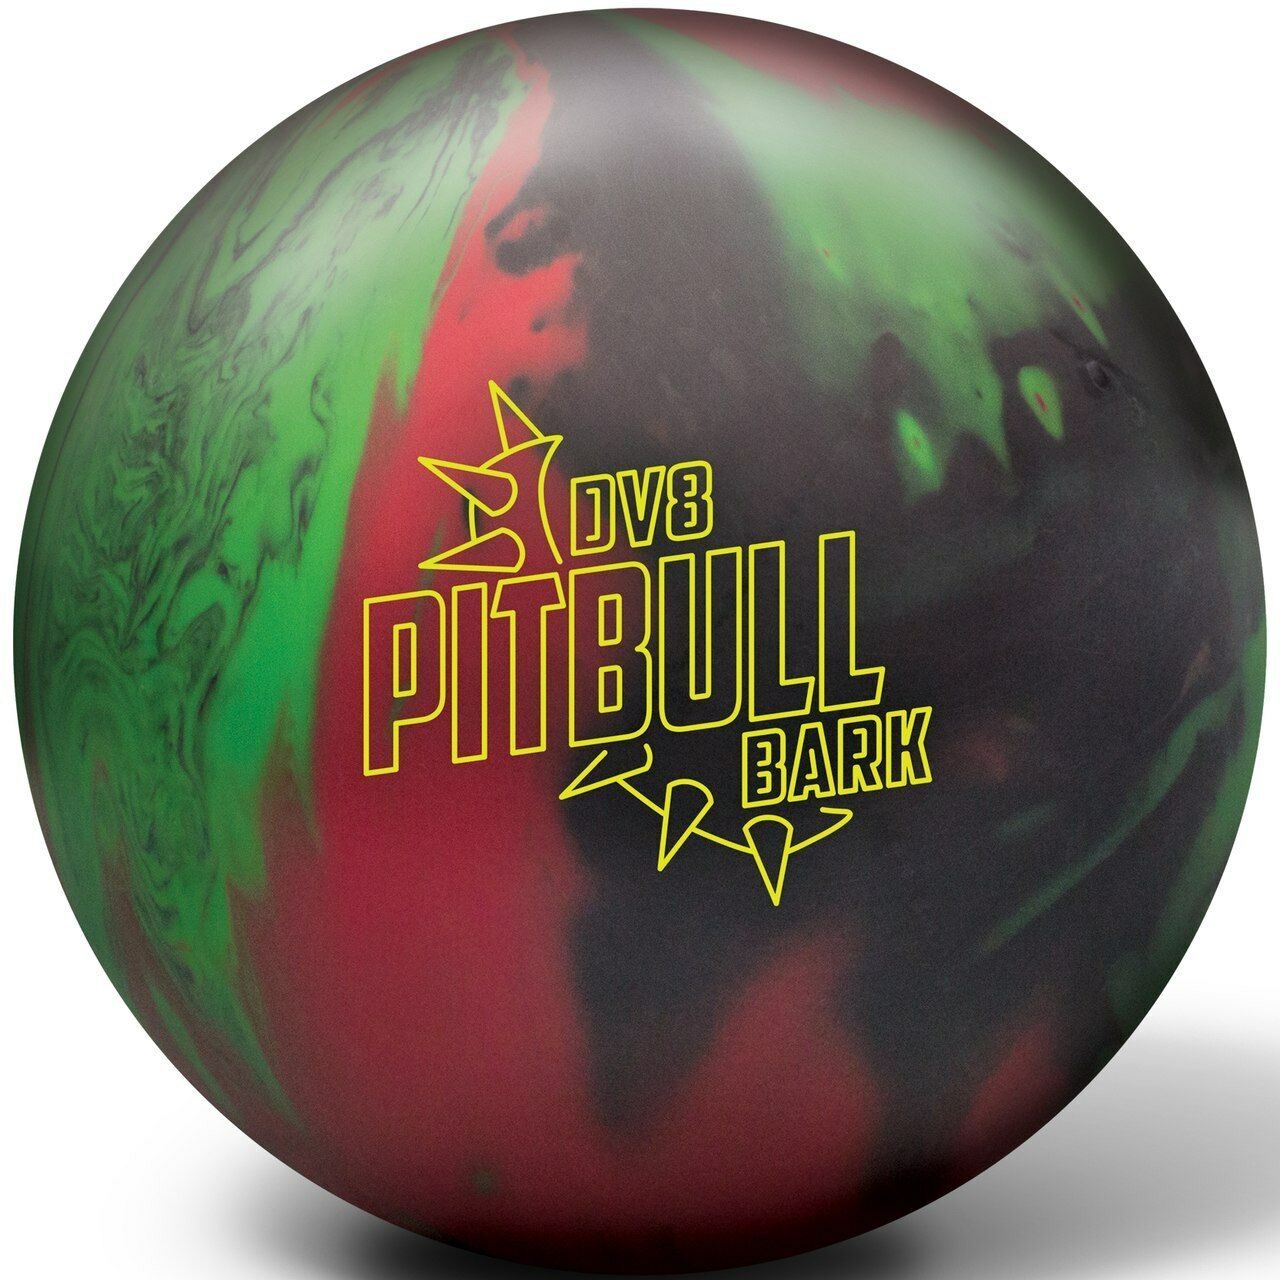 DV8 Pitbull Bark Bowling Ball NIB 1st Quality